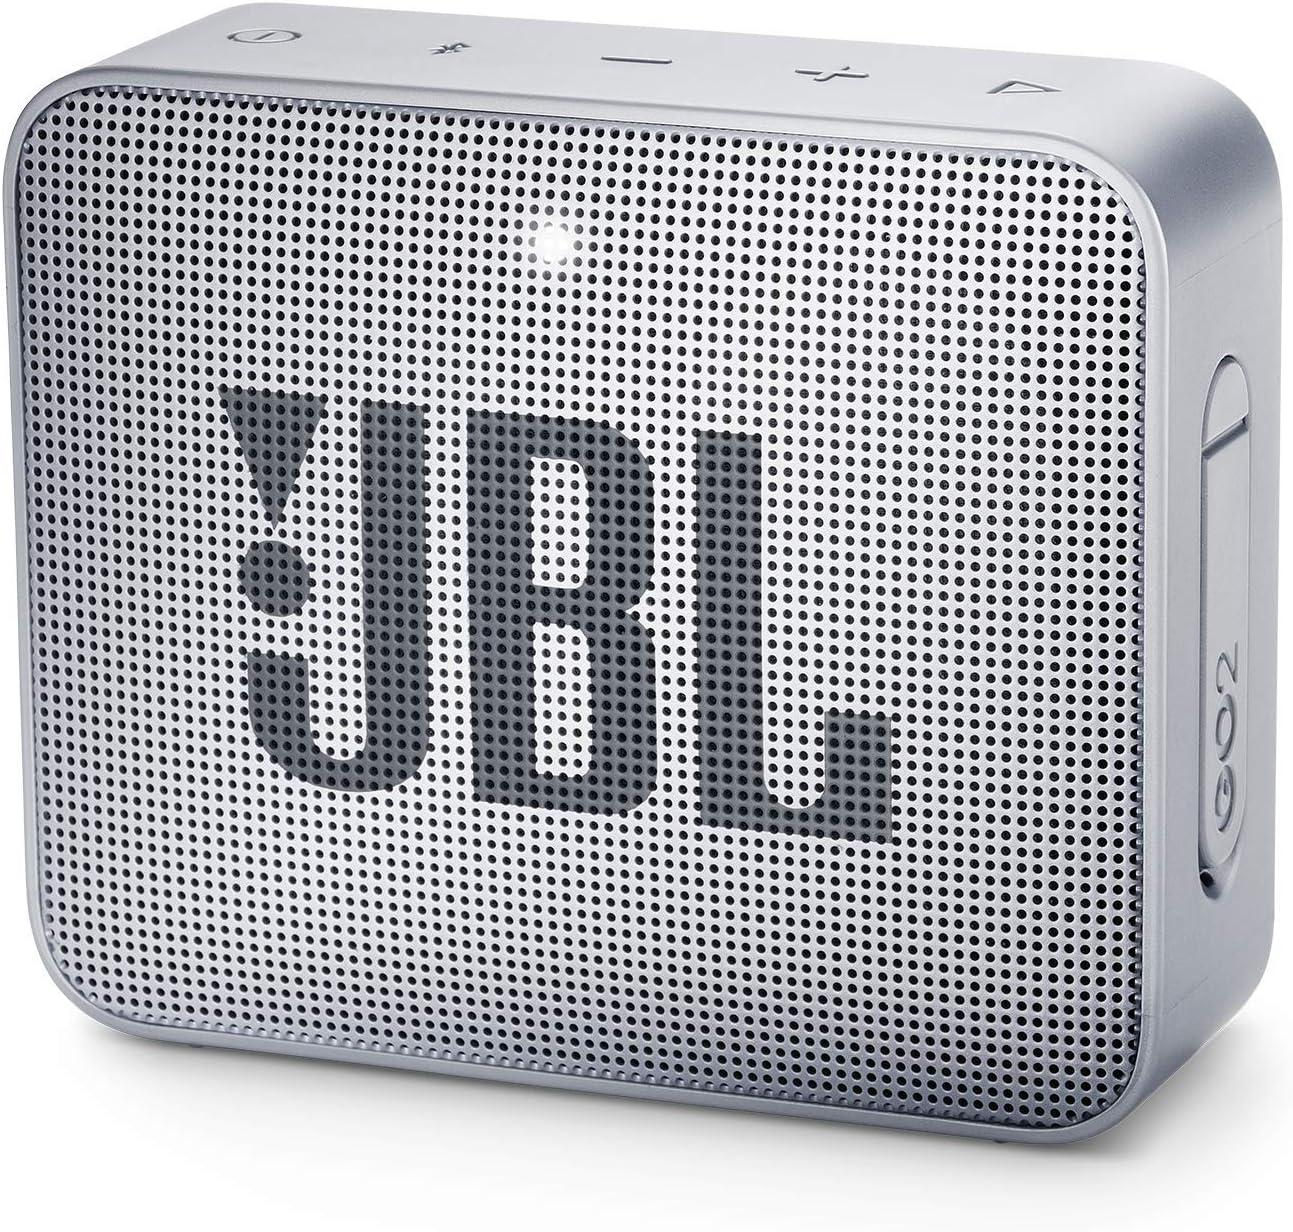 JBL Go 2 Portable Bluetooth Waterproof Speaker, Grey, 4.3 X 4.5 X 1.5